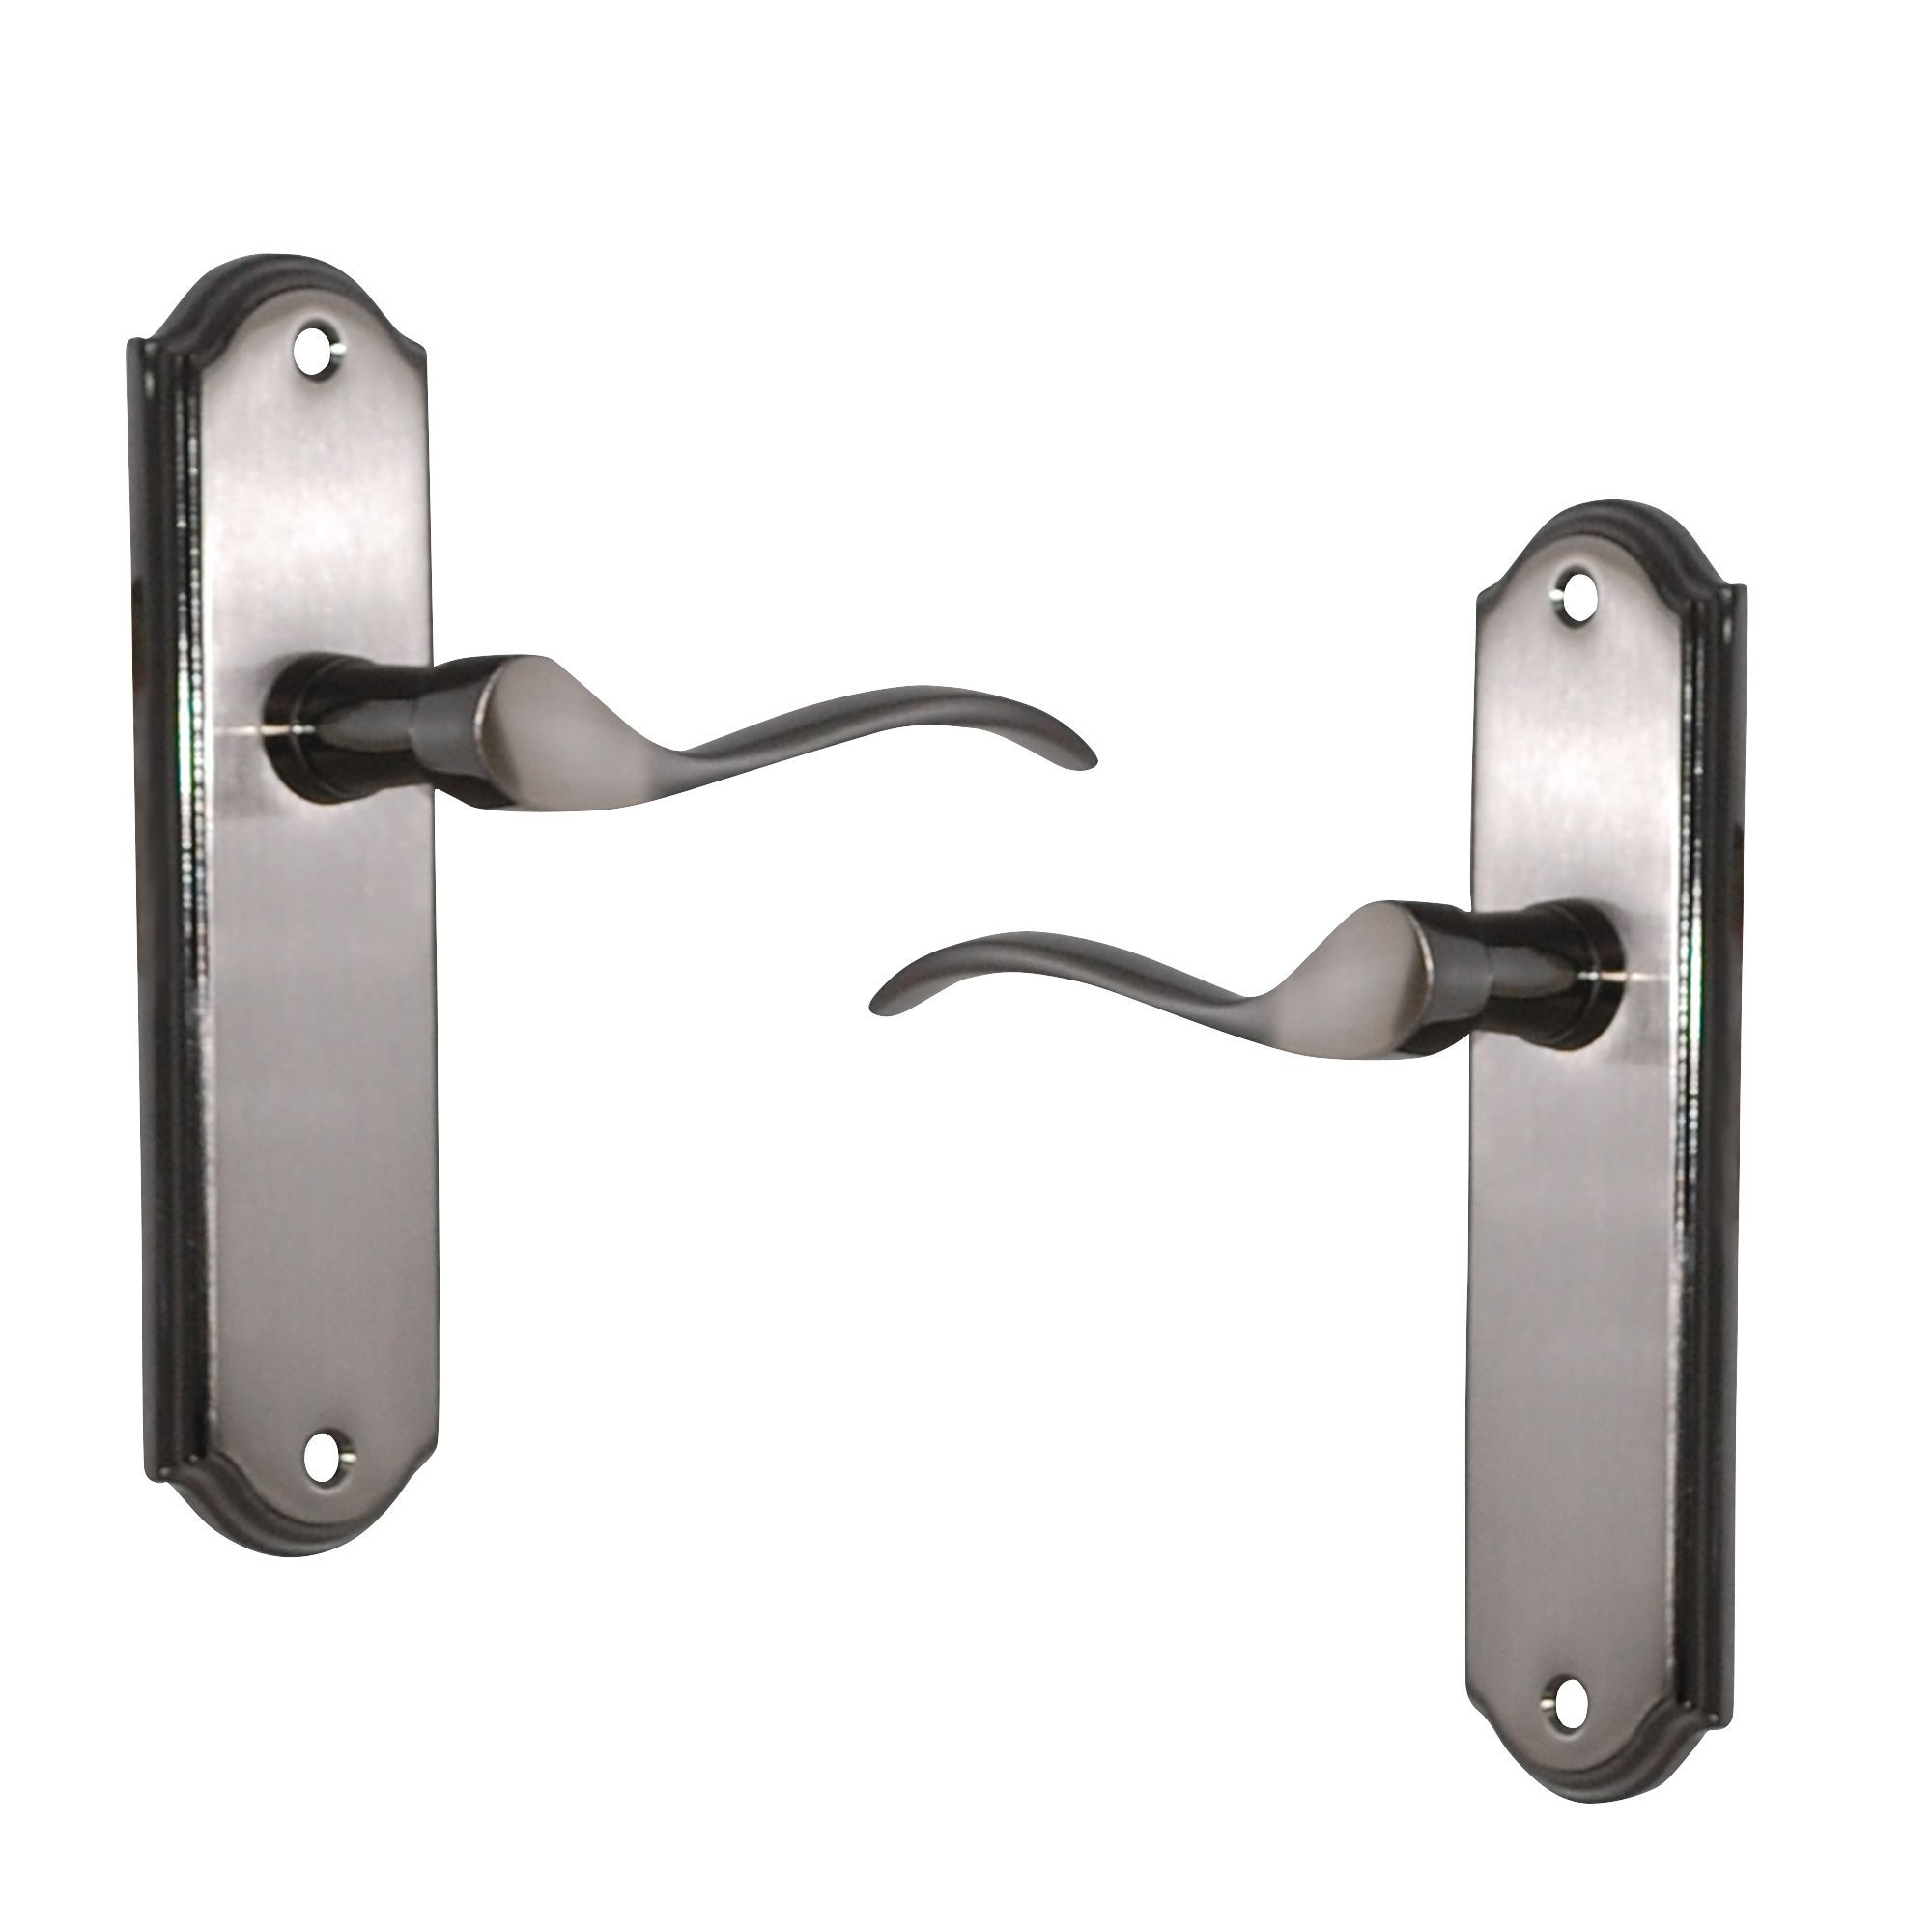 Satin Iridium Effect Internal Straight Latch Door Handle, 1 Set